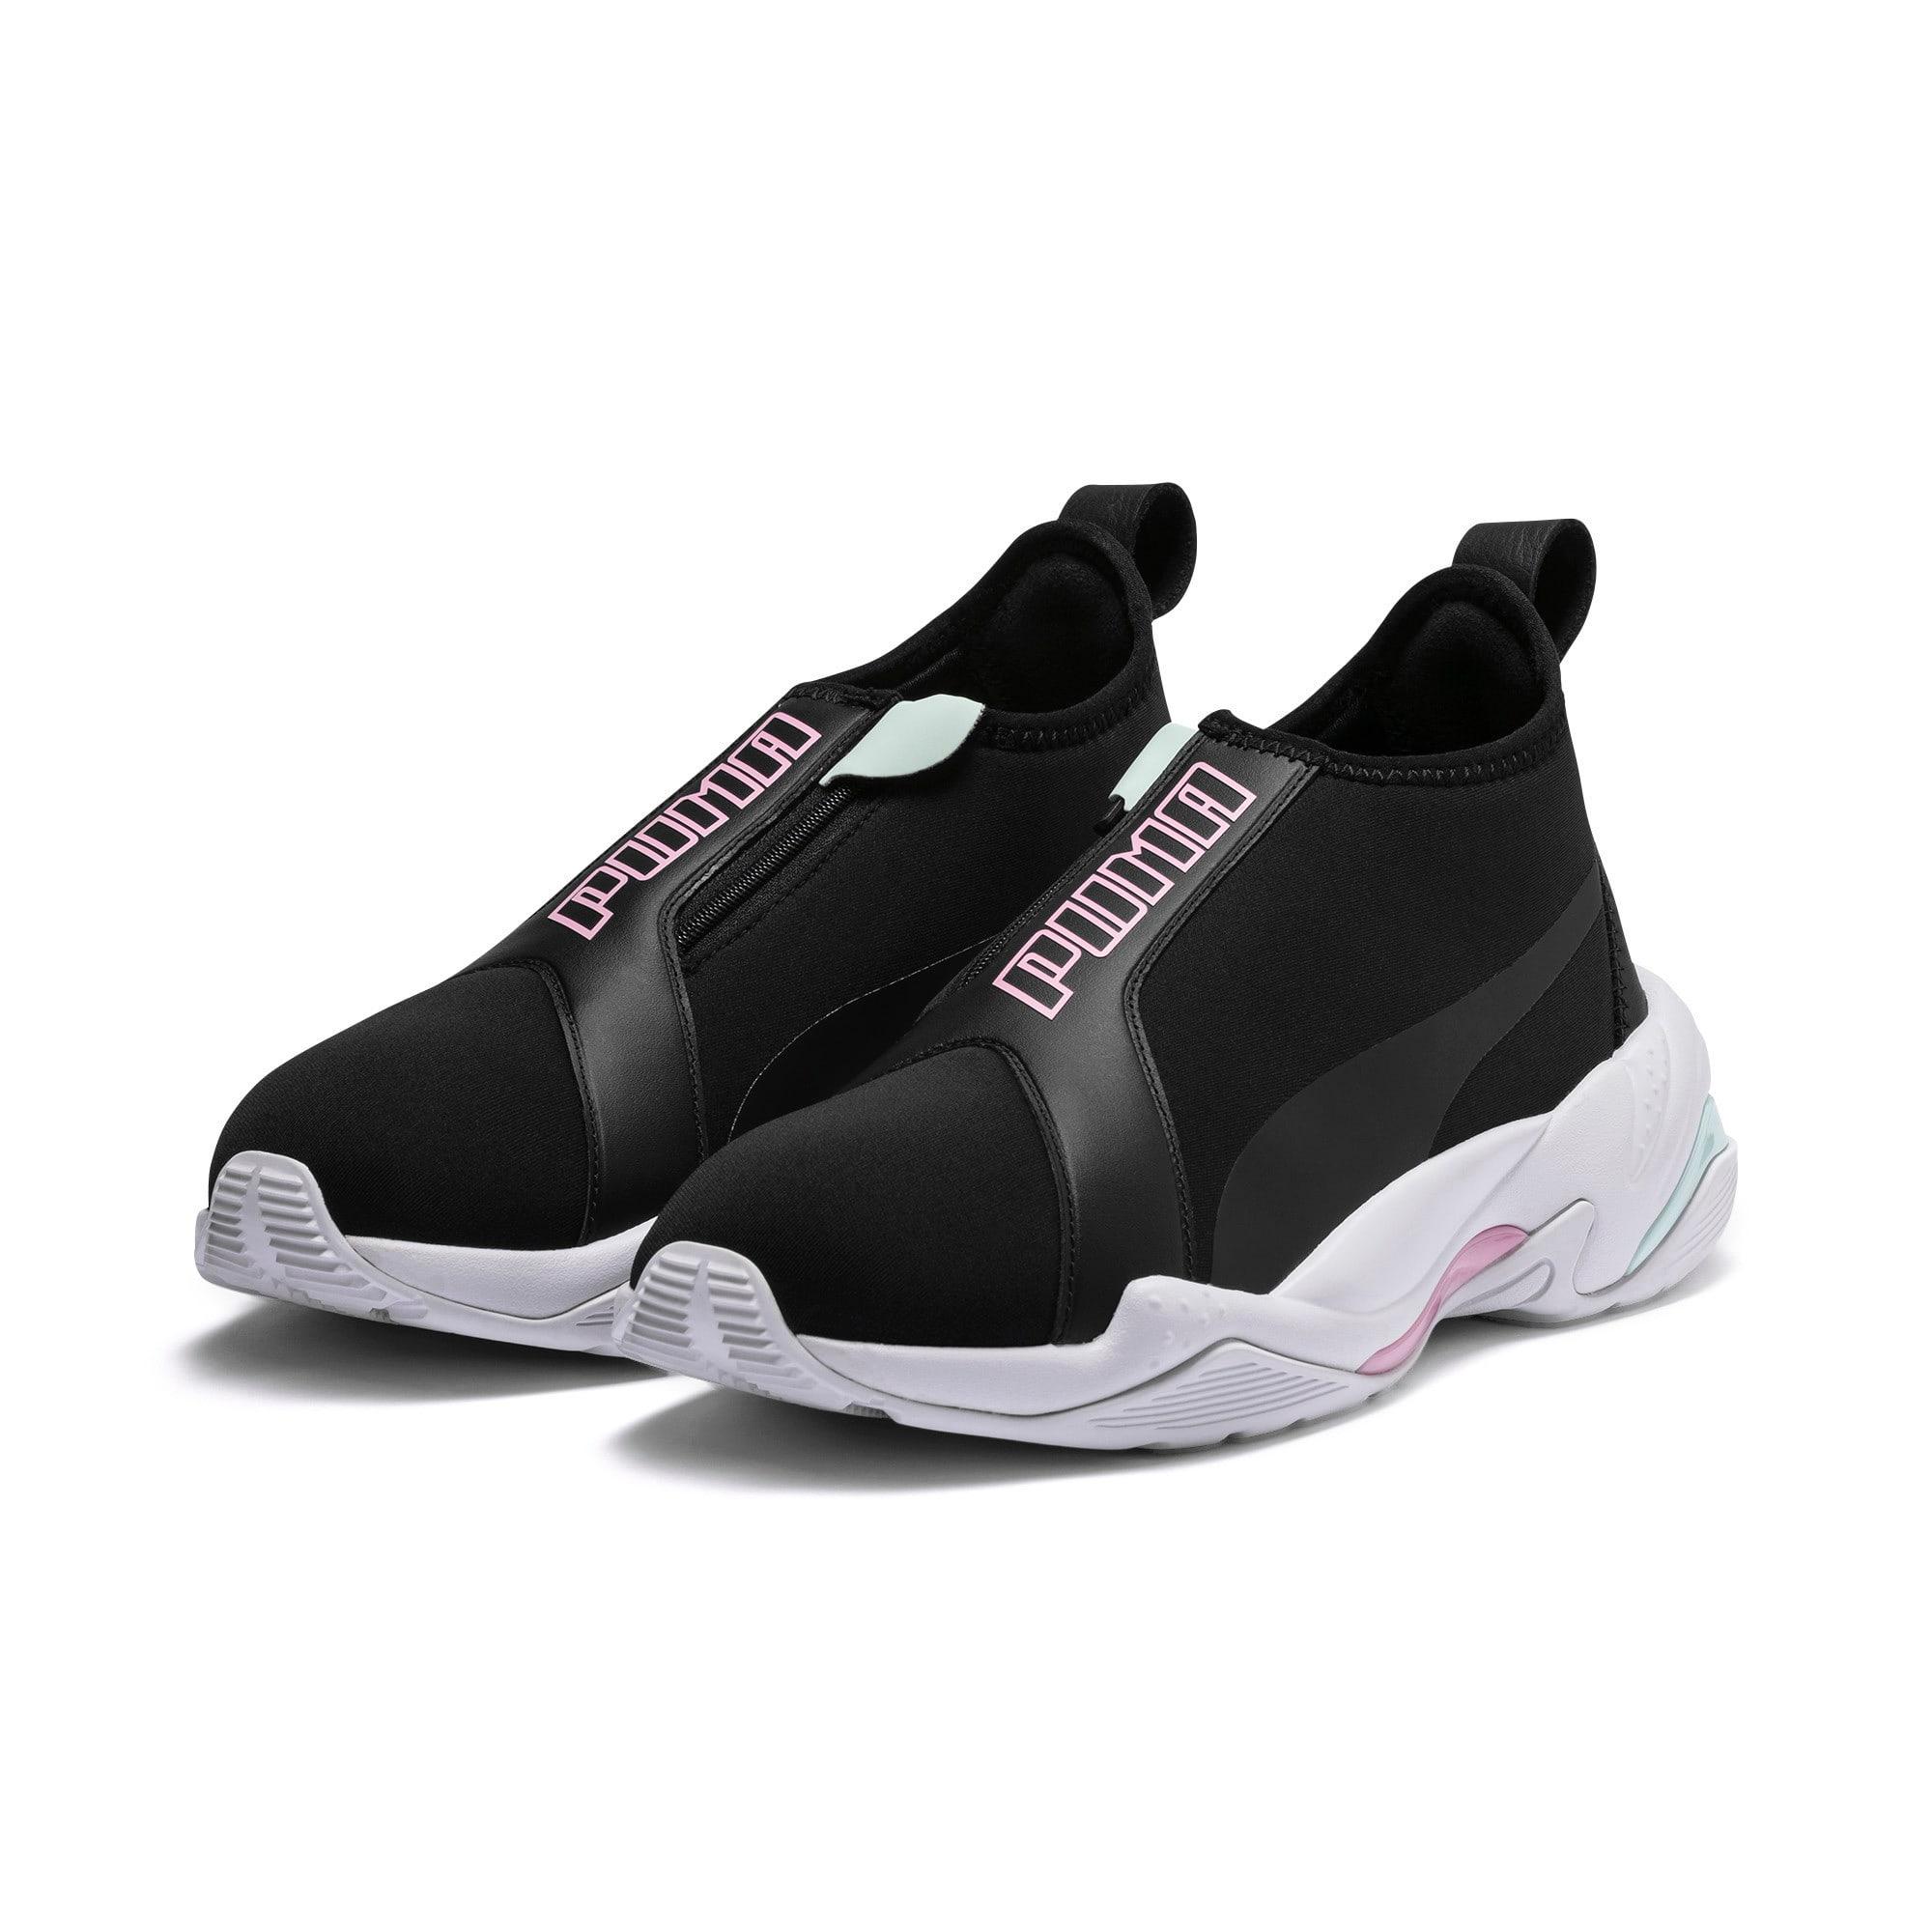 Miniatura 3 de Zapatos deportivos para mujer Thunder Trailblazer, Puma Black-Pale Pink, mediano